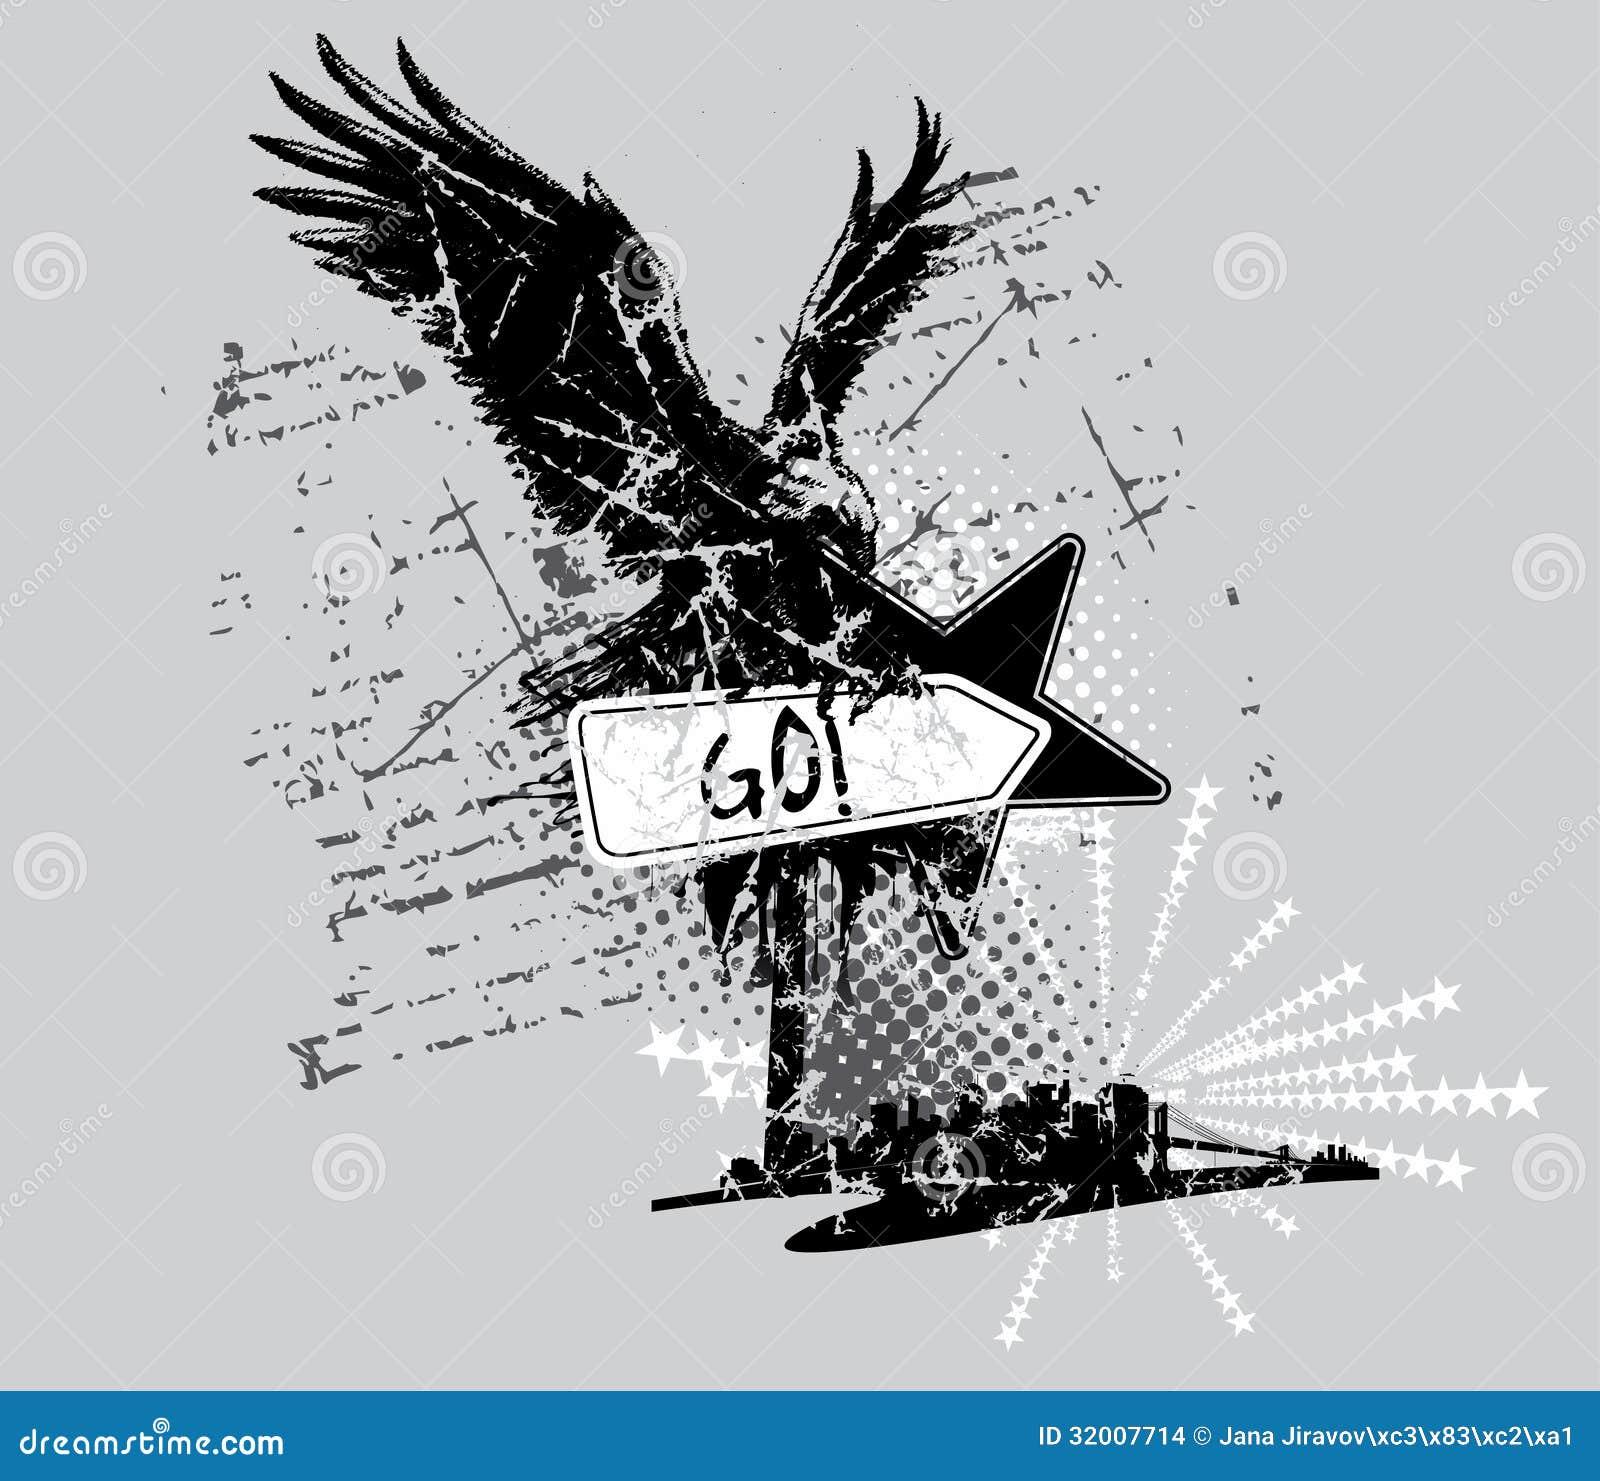 Shirt design style - Eagle T Shirt Design